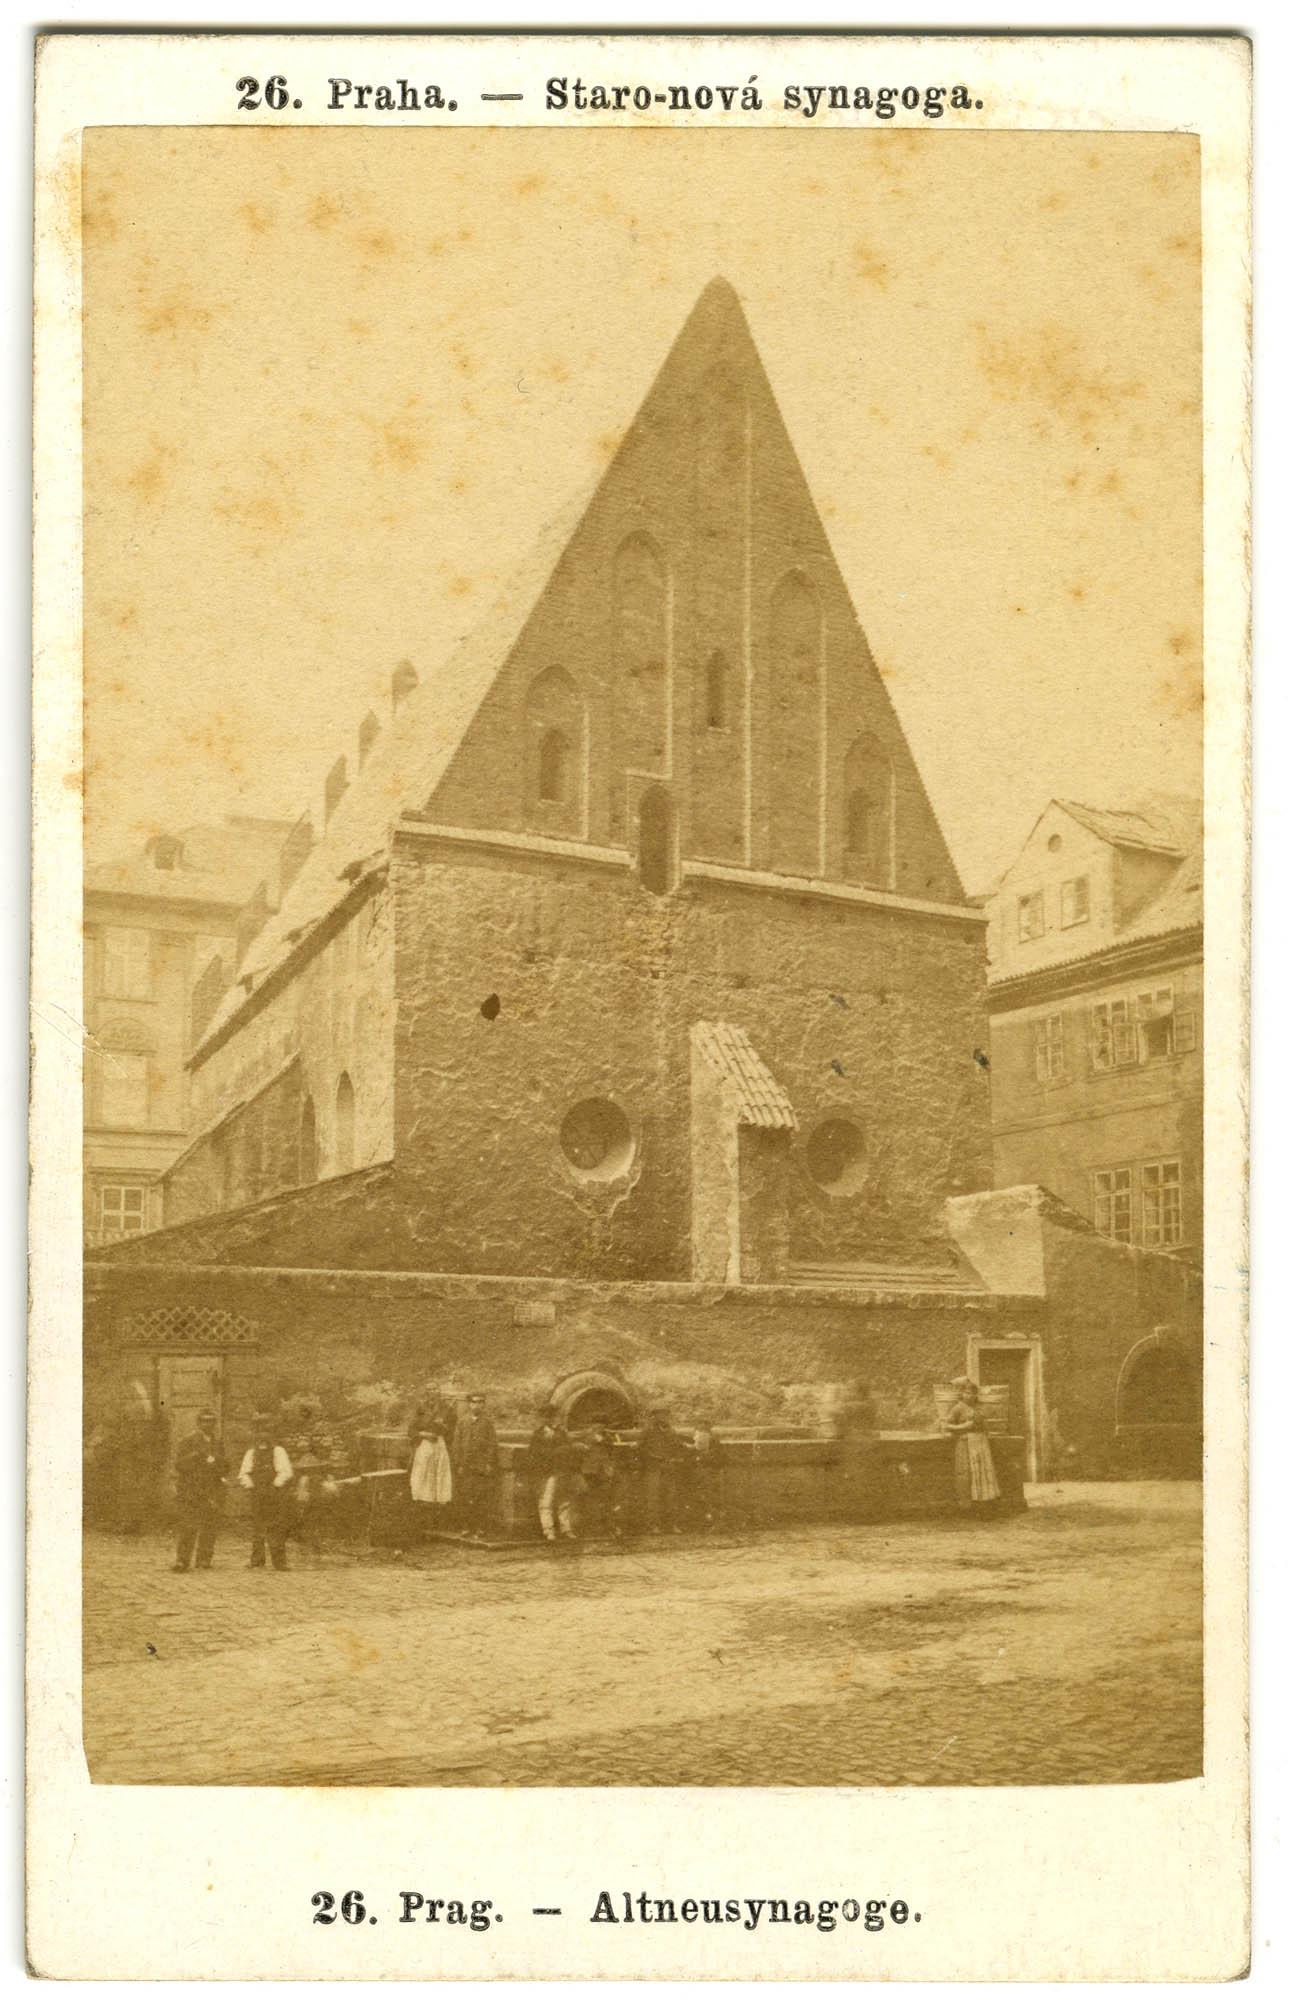 Praha. - Staro-nová synagoga. / Prag. - Altneusynagoge.